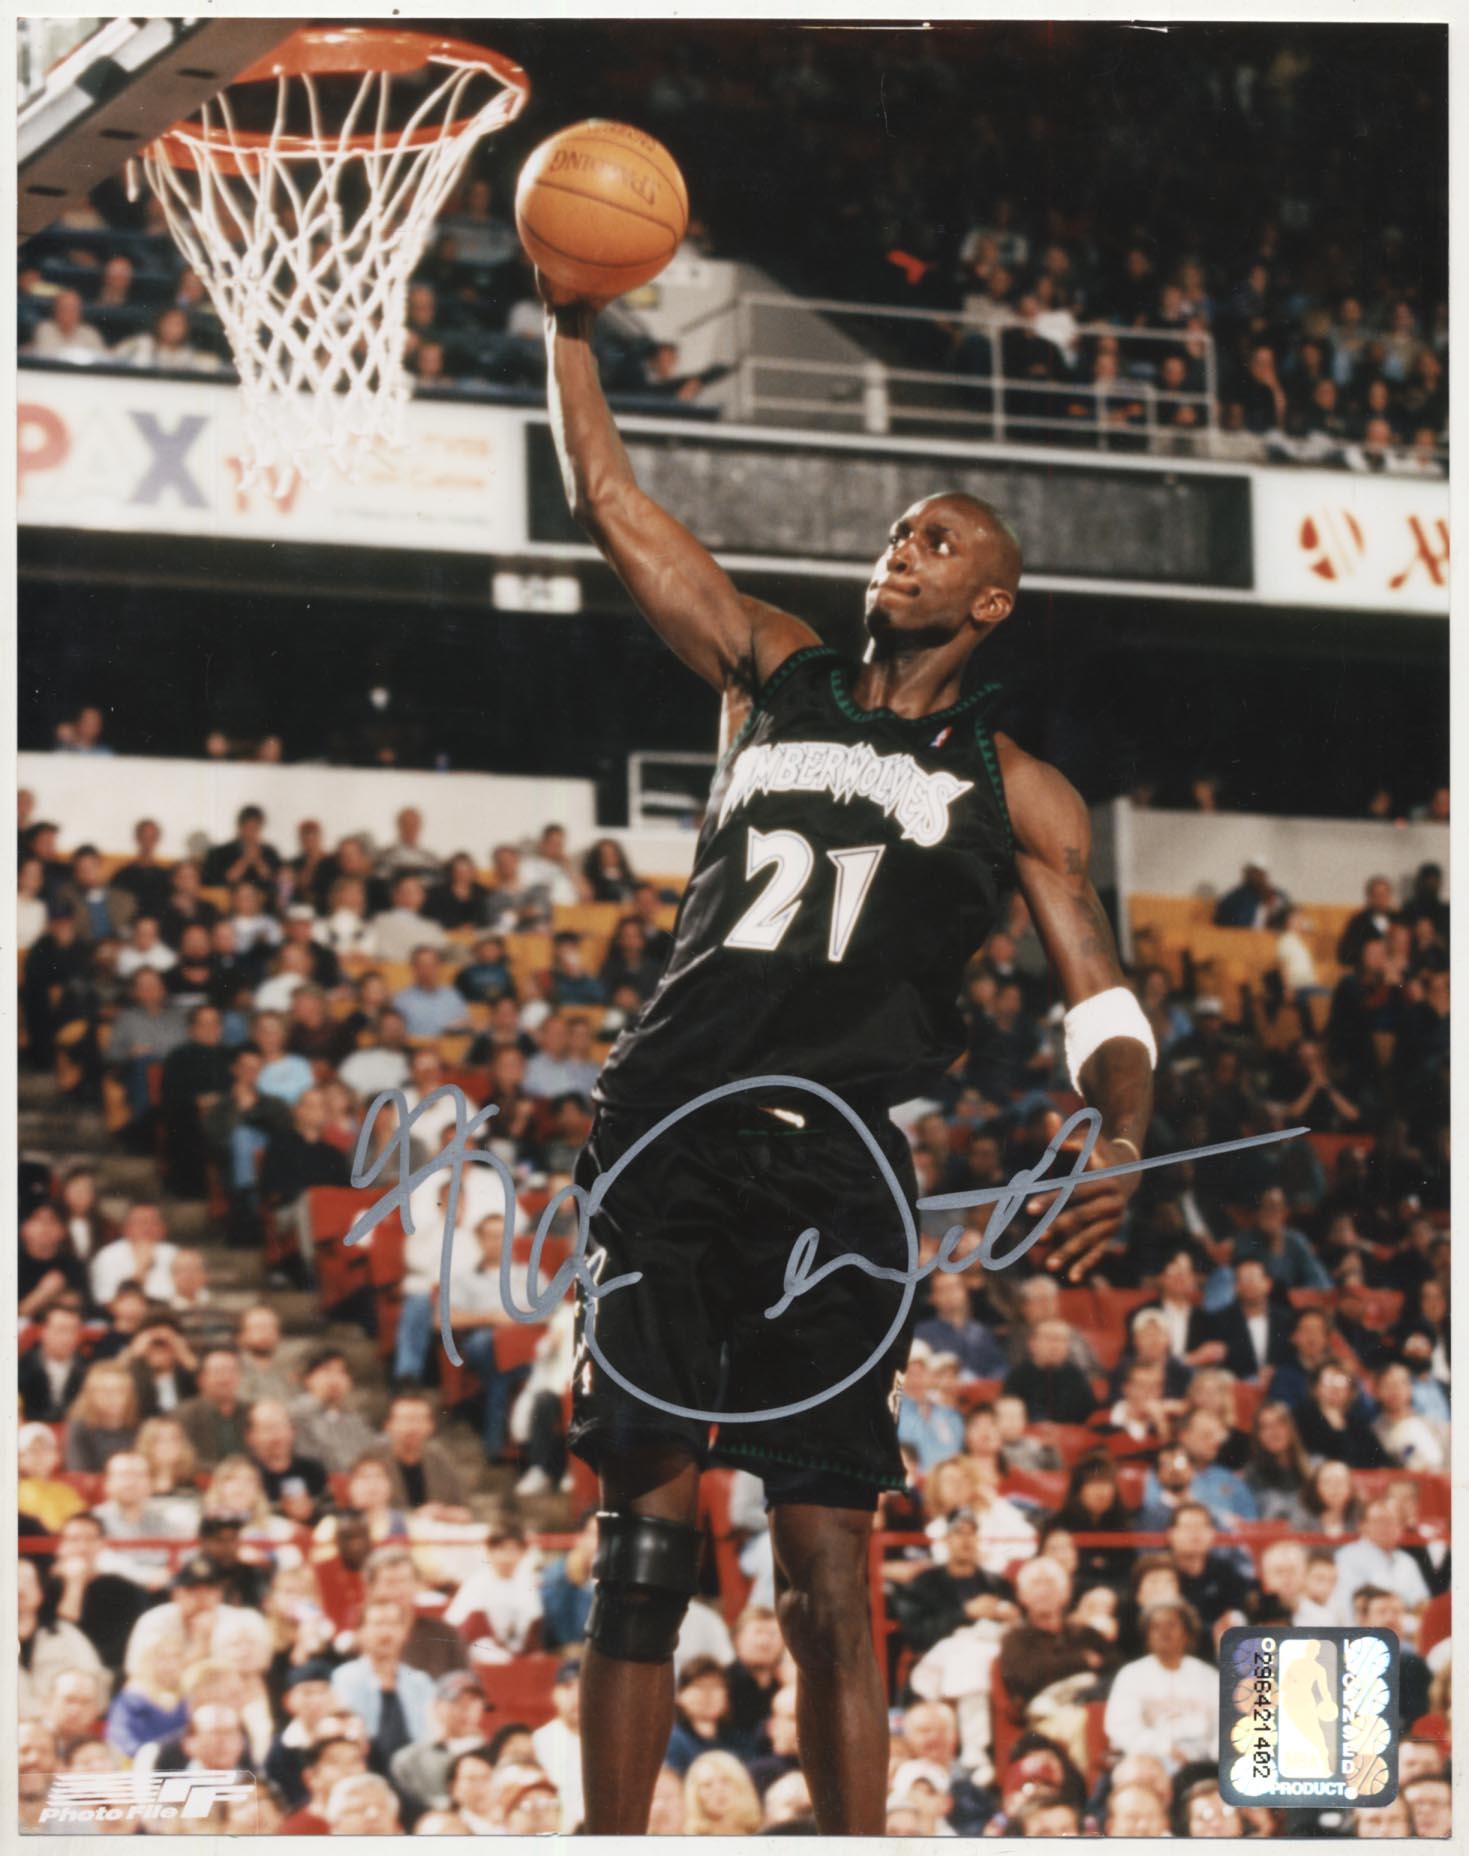 Lot #791  8 x 10  Garnett, Kevin (Timberwolves) (JSA LOA) Cond: 9.5